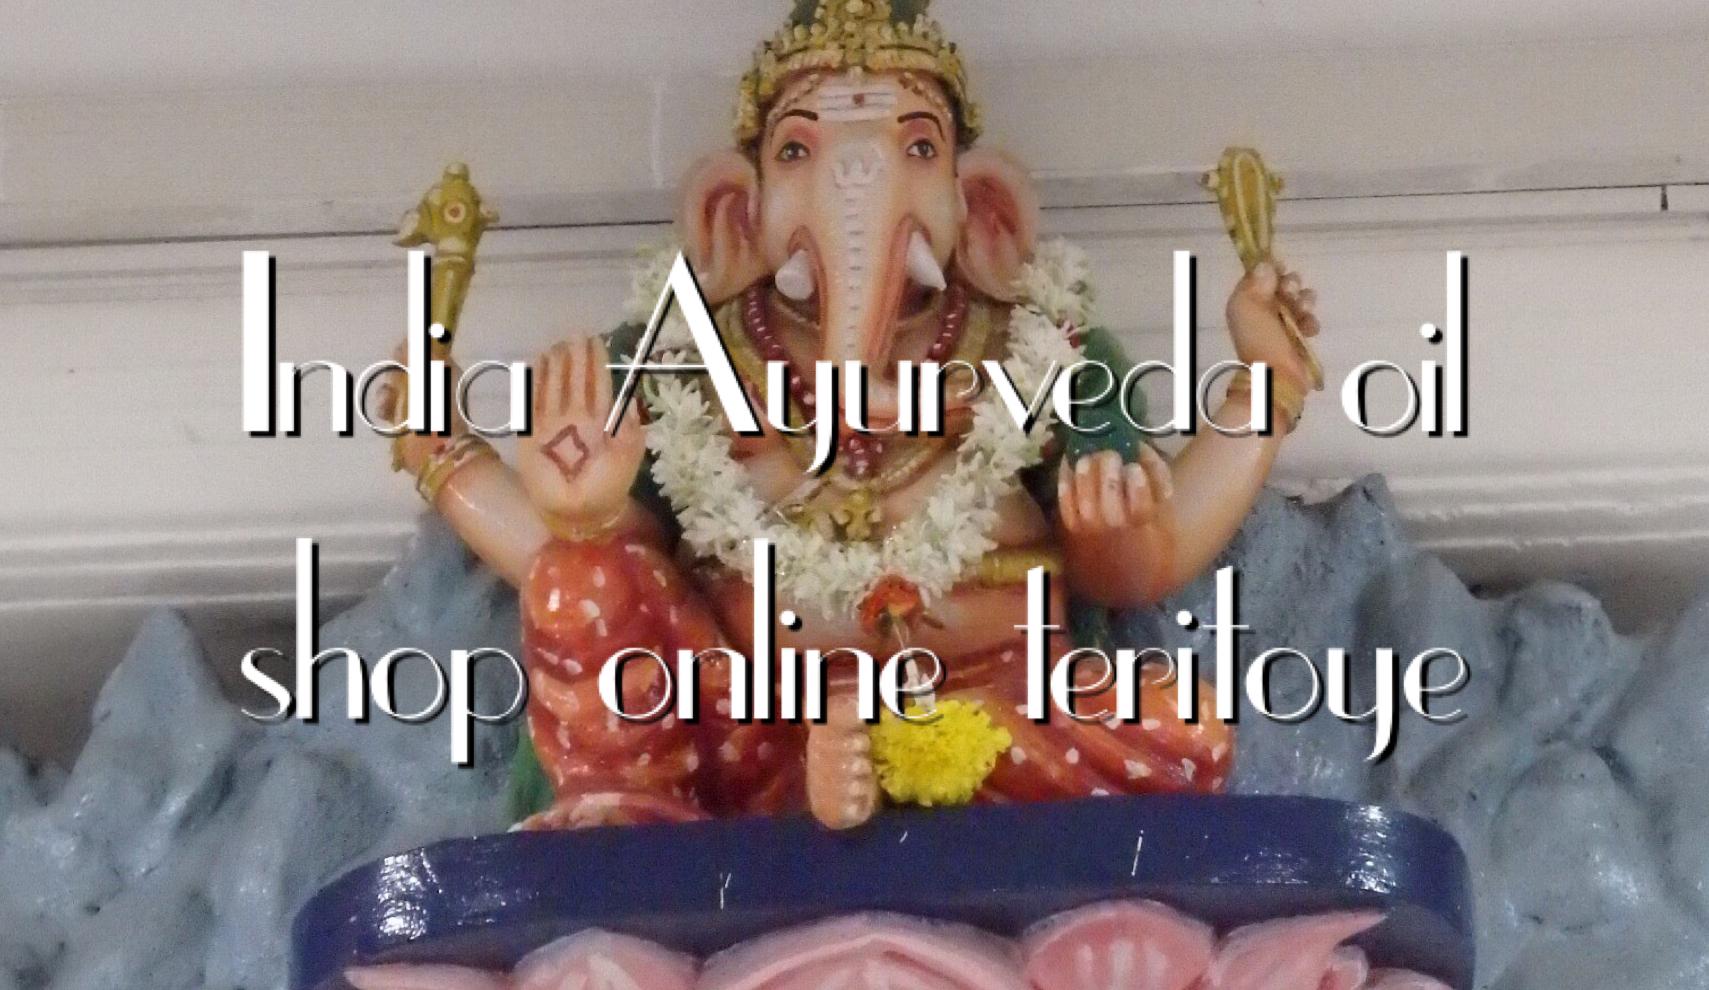 India Ayurveda oil shop online teritoye